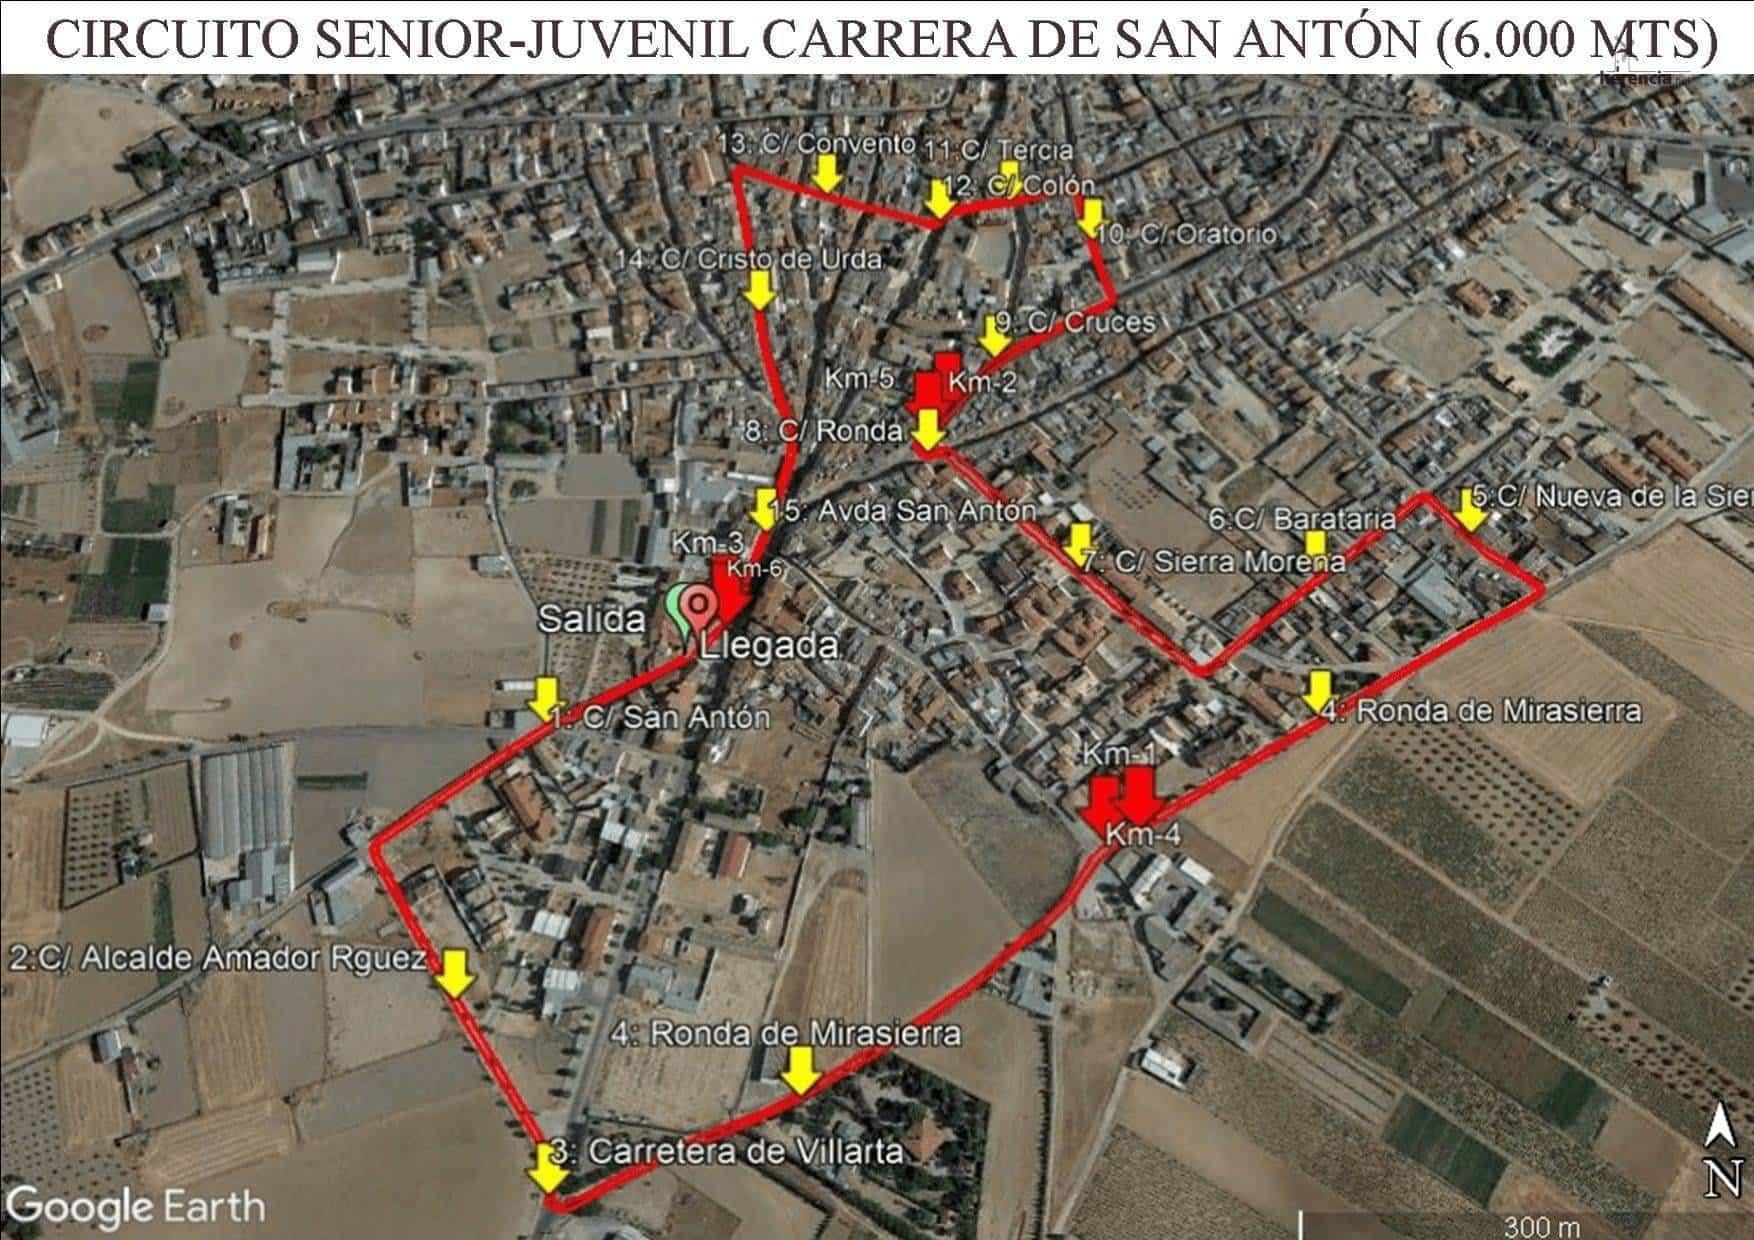 Circuito Senior Juvenil CPSA - XVIII Carrera popular de San Antón contra el cáncer